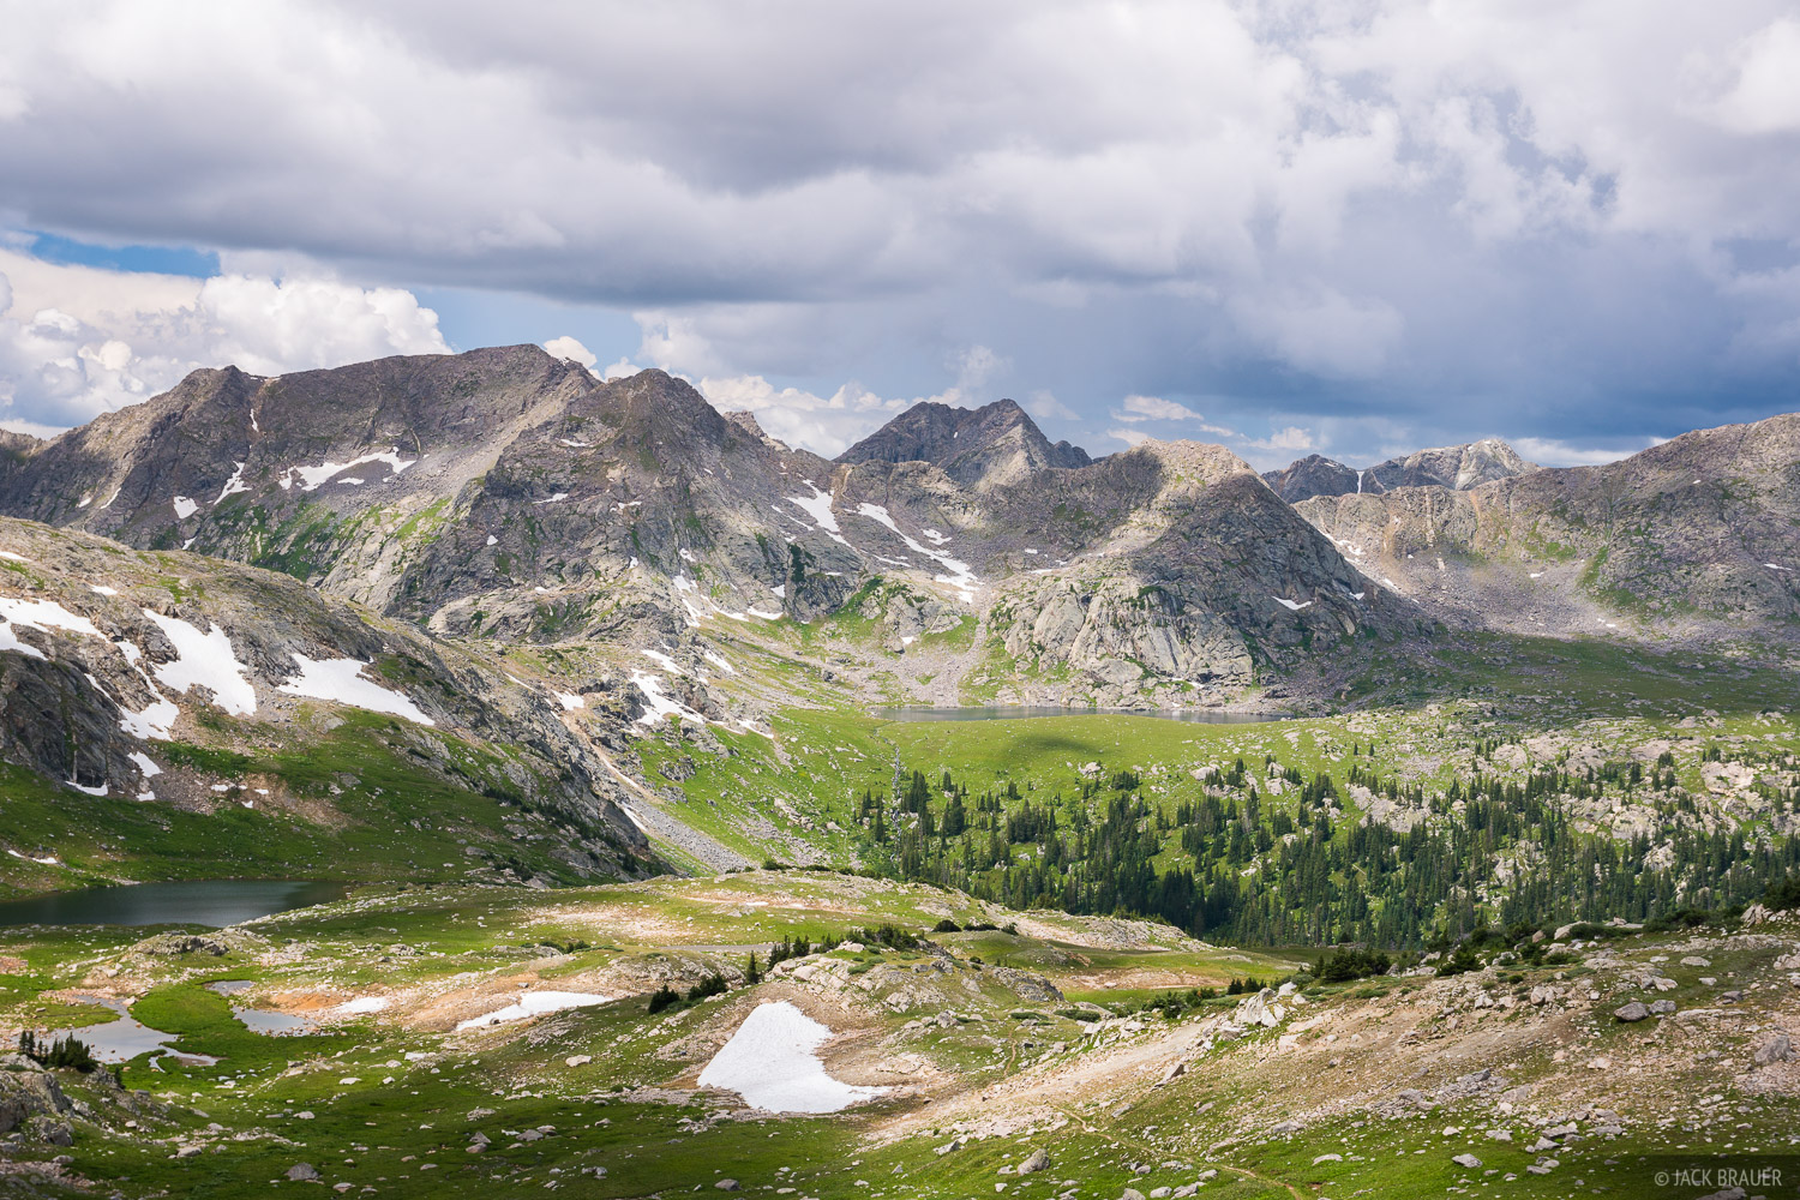 Colorado, Fancy Pass, Holy Cross Wilderness, Treasure Vault Lake, Sawatch Range, photo